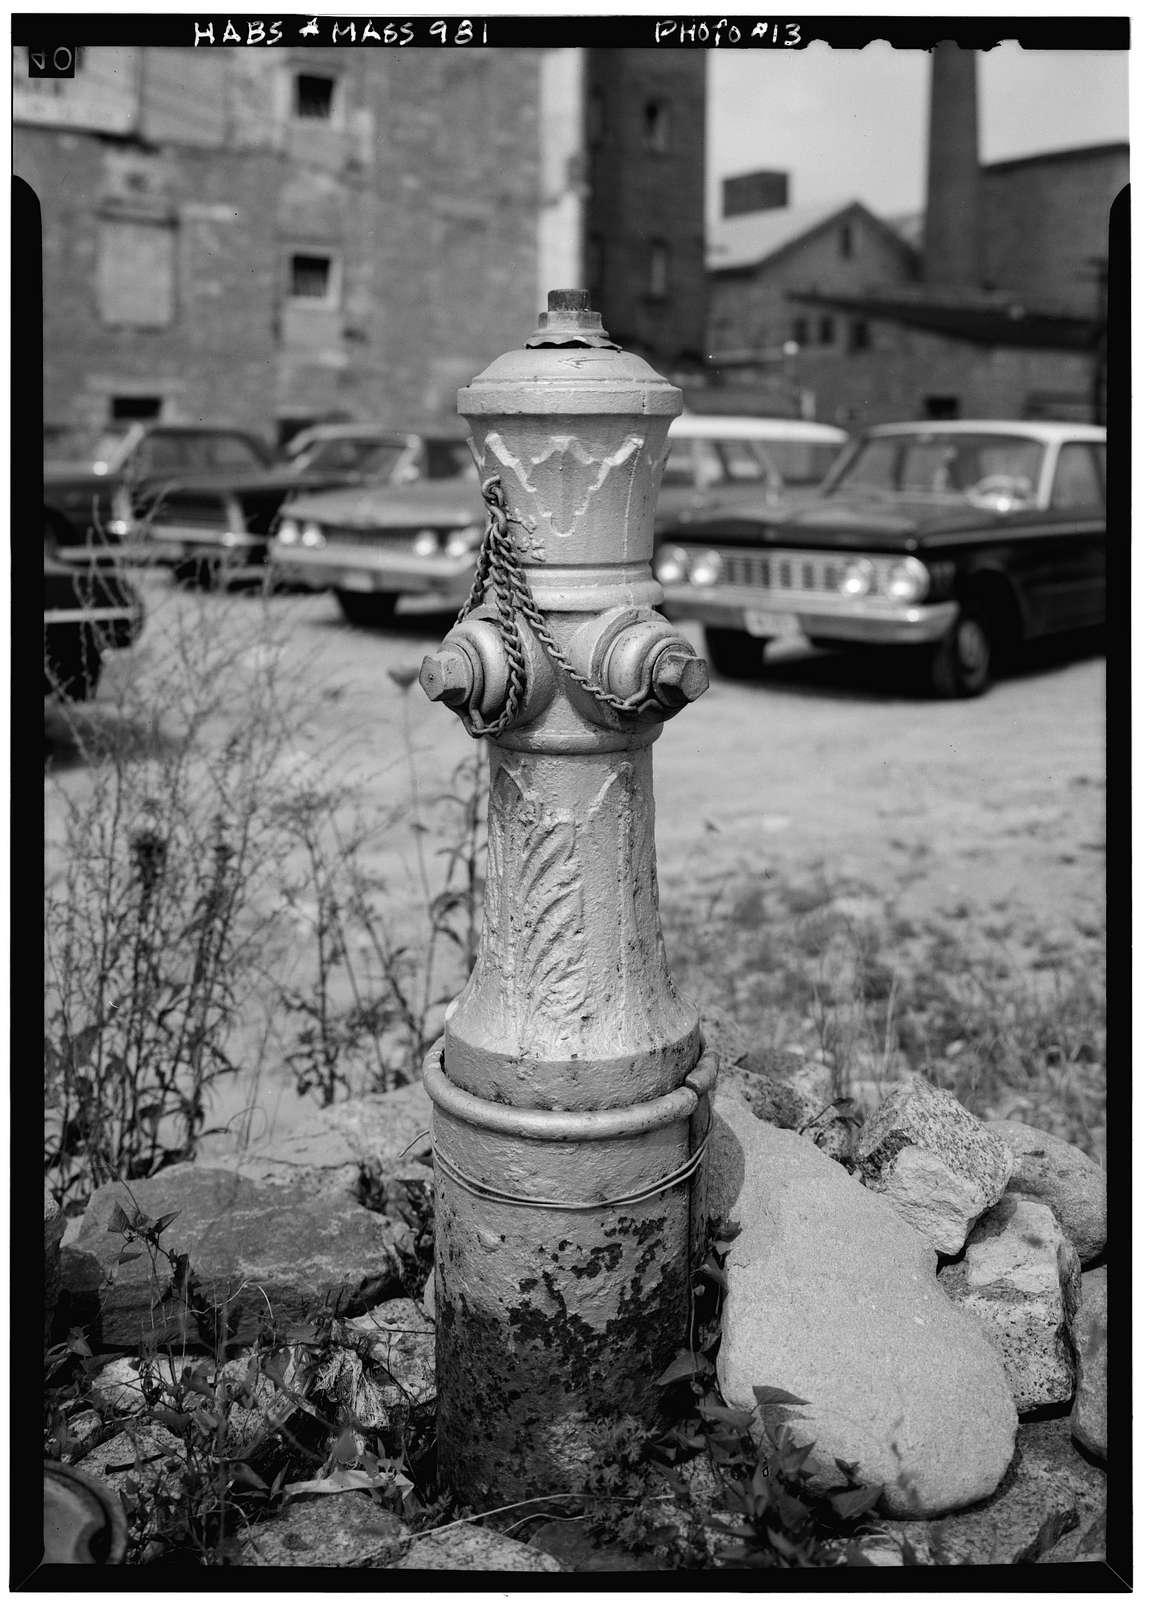 Union Mills, Pleasant Street & Highway I-195, Interchange No. 12, Fall River, Bristol County, MA